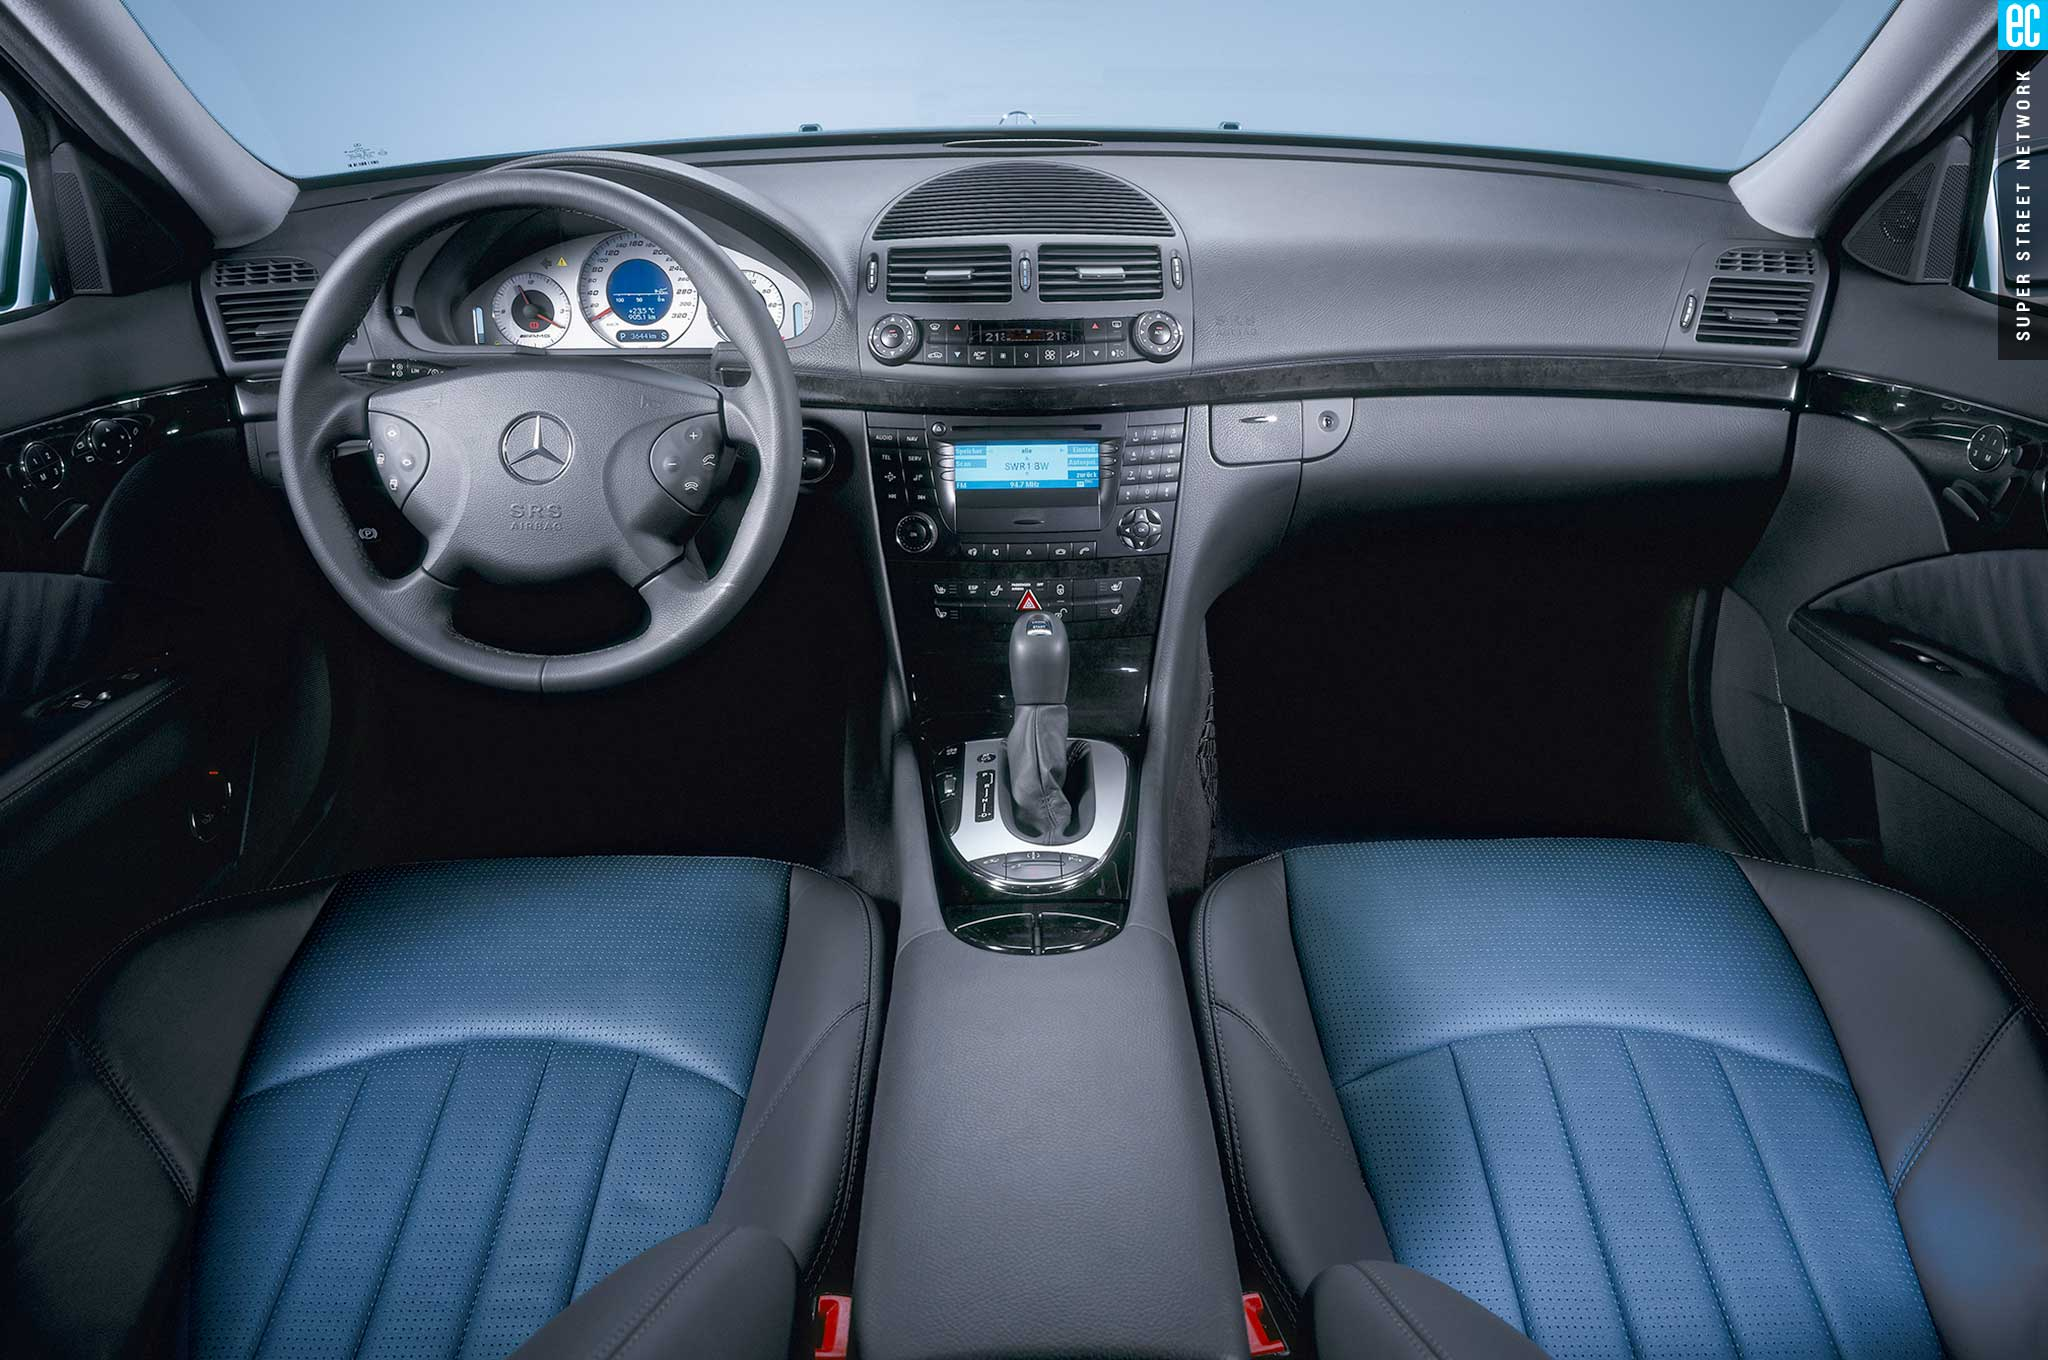 2003-2006 Mercedes E55 AMG - Buying A Living Legend